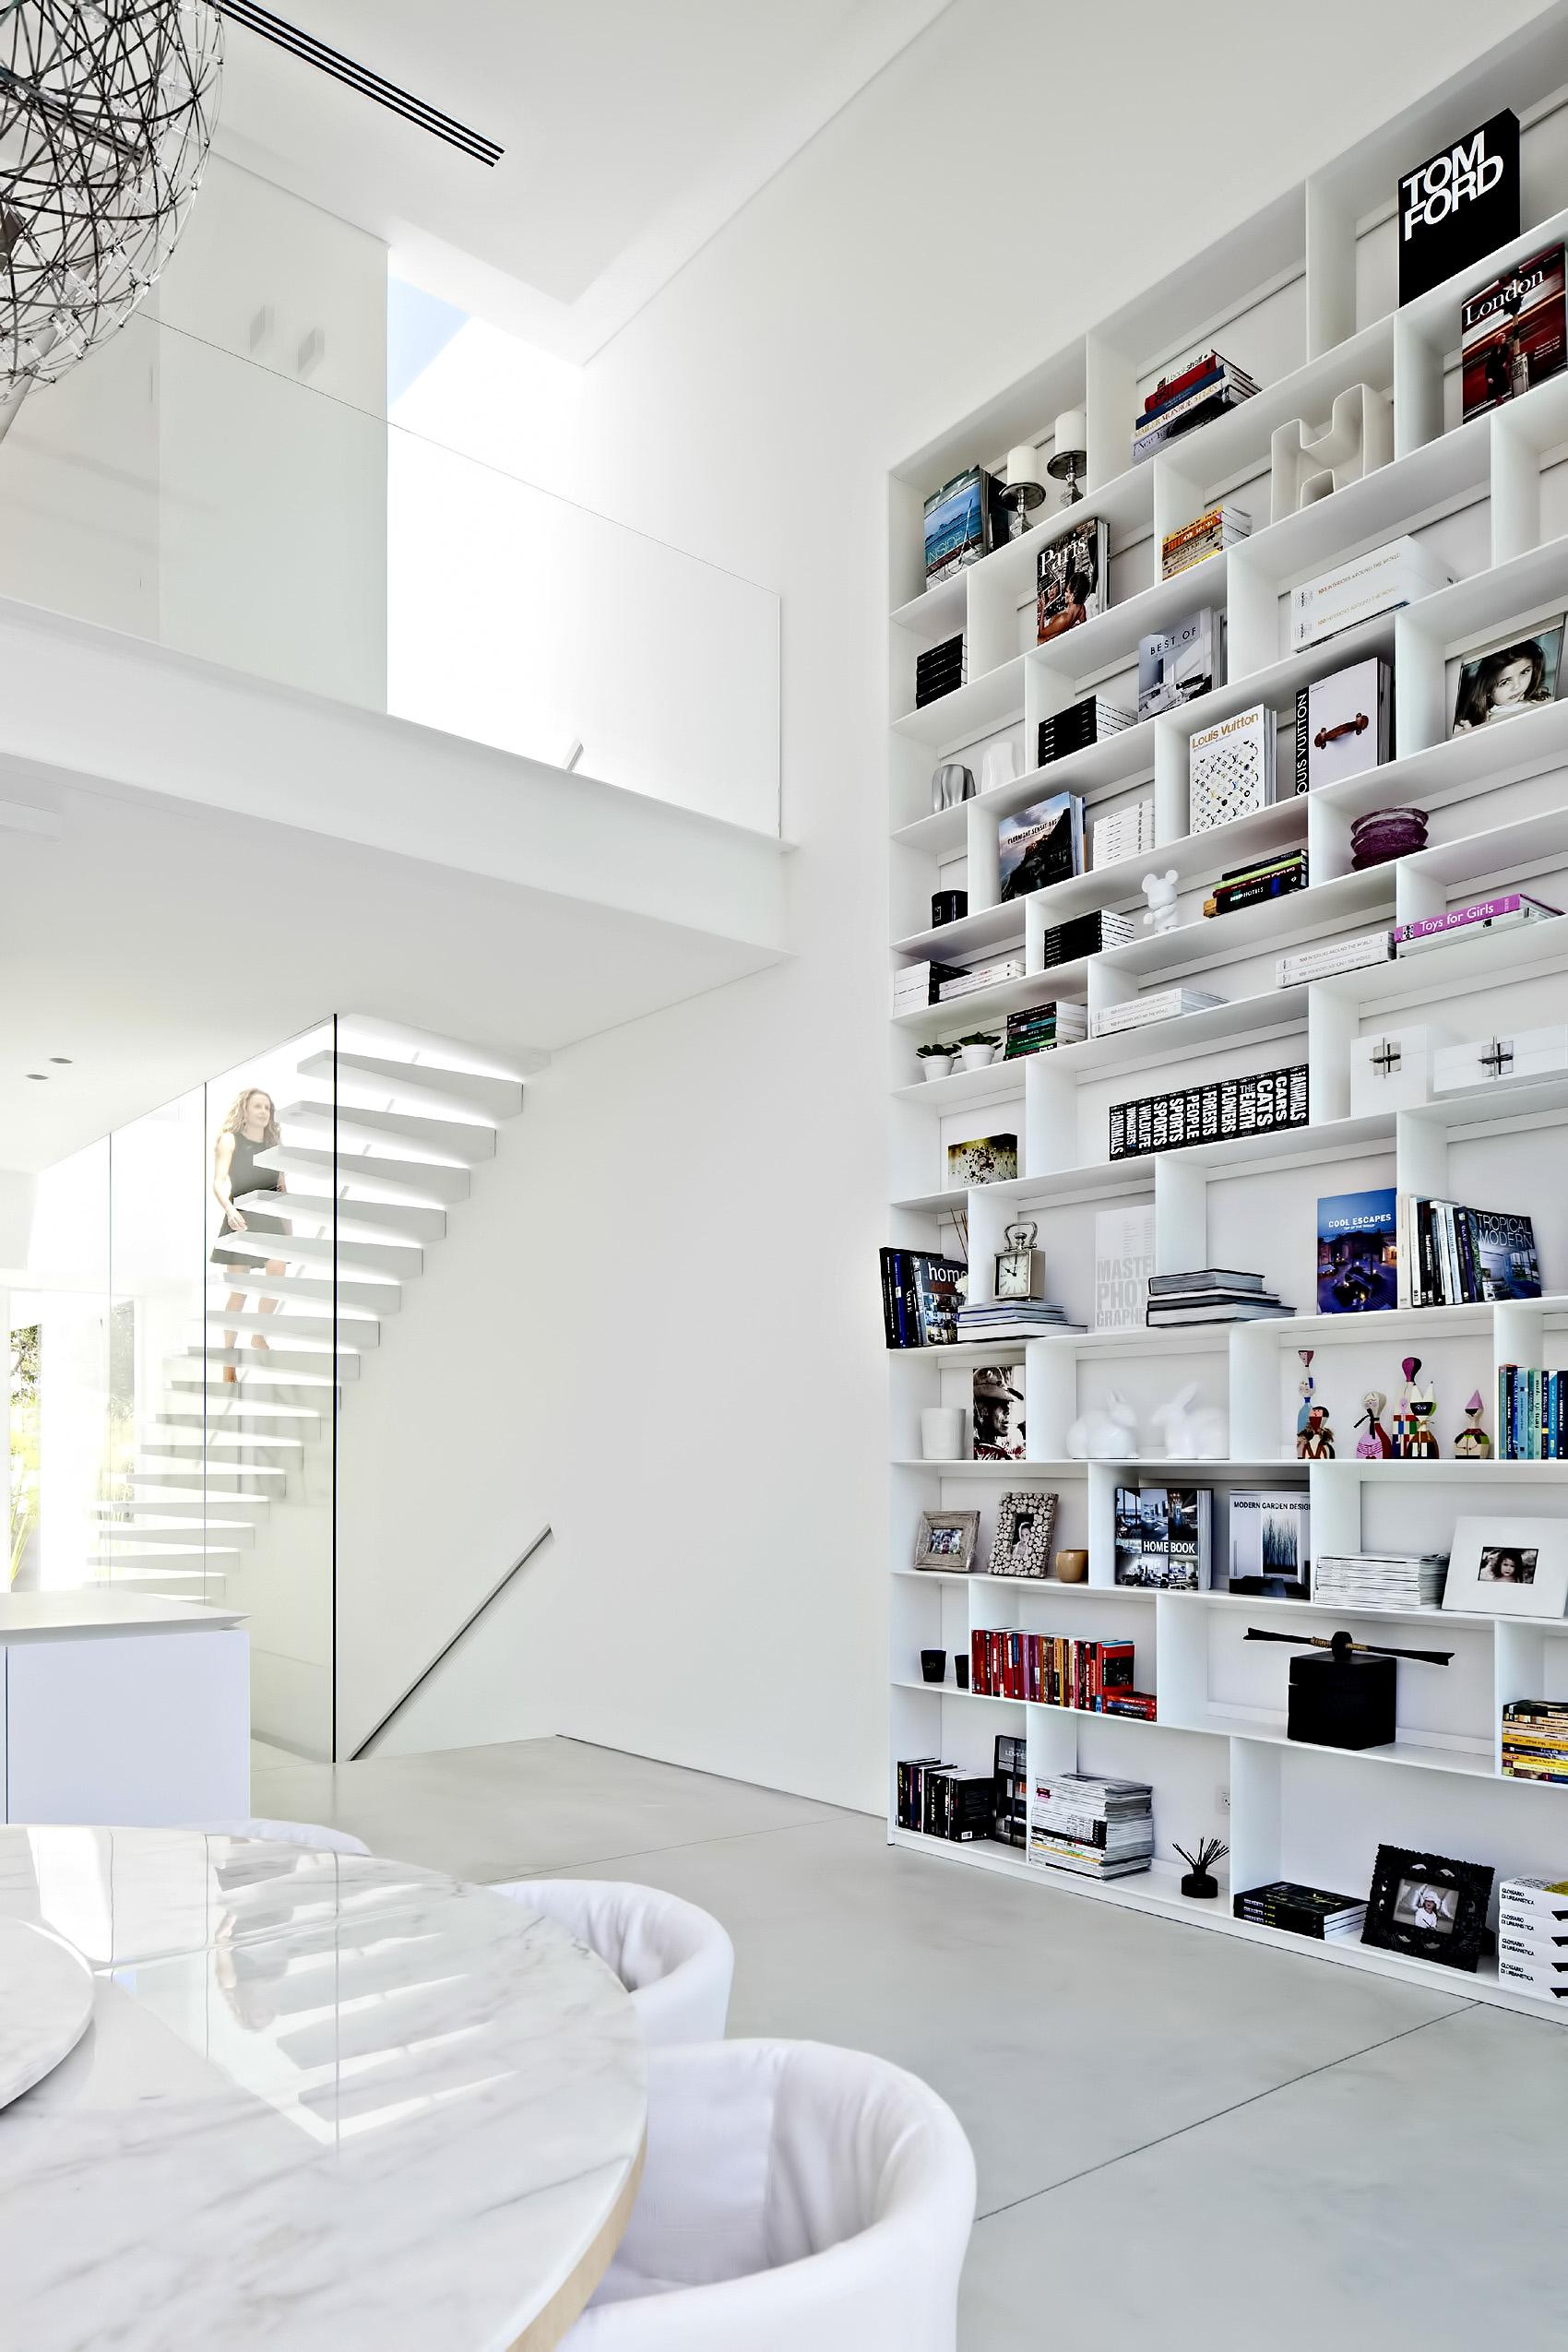 Barak House Luxury Residence – Ramat HaSharon, Tel Aviv, Israel